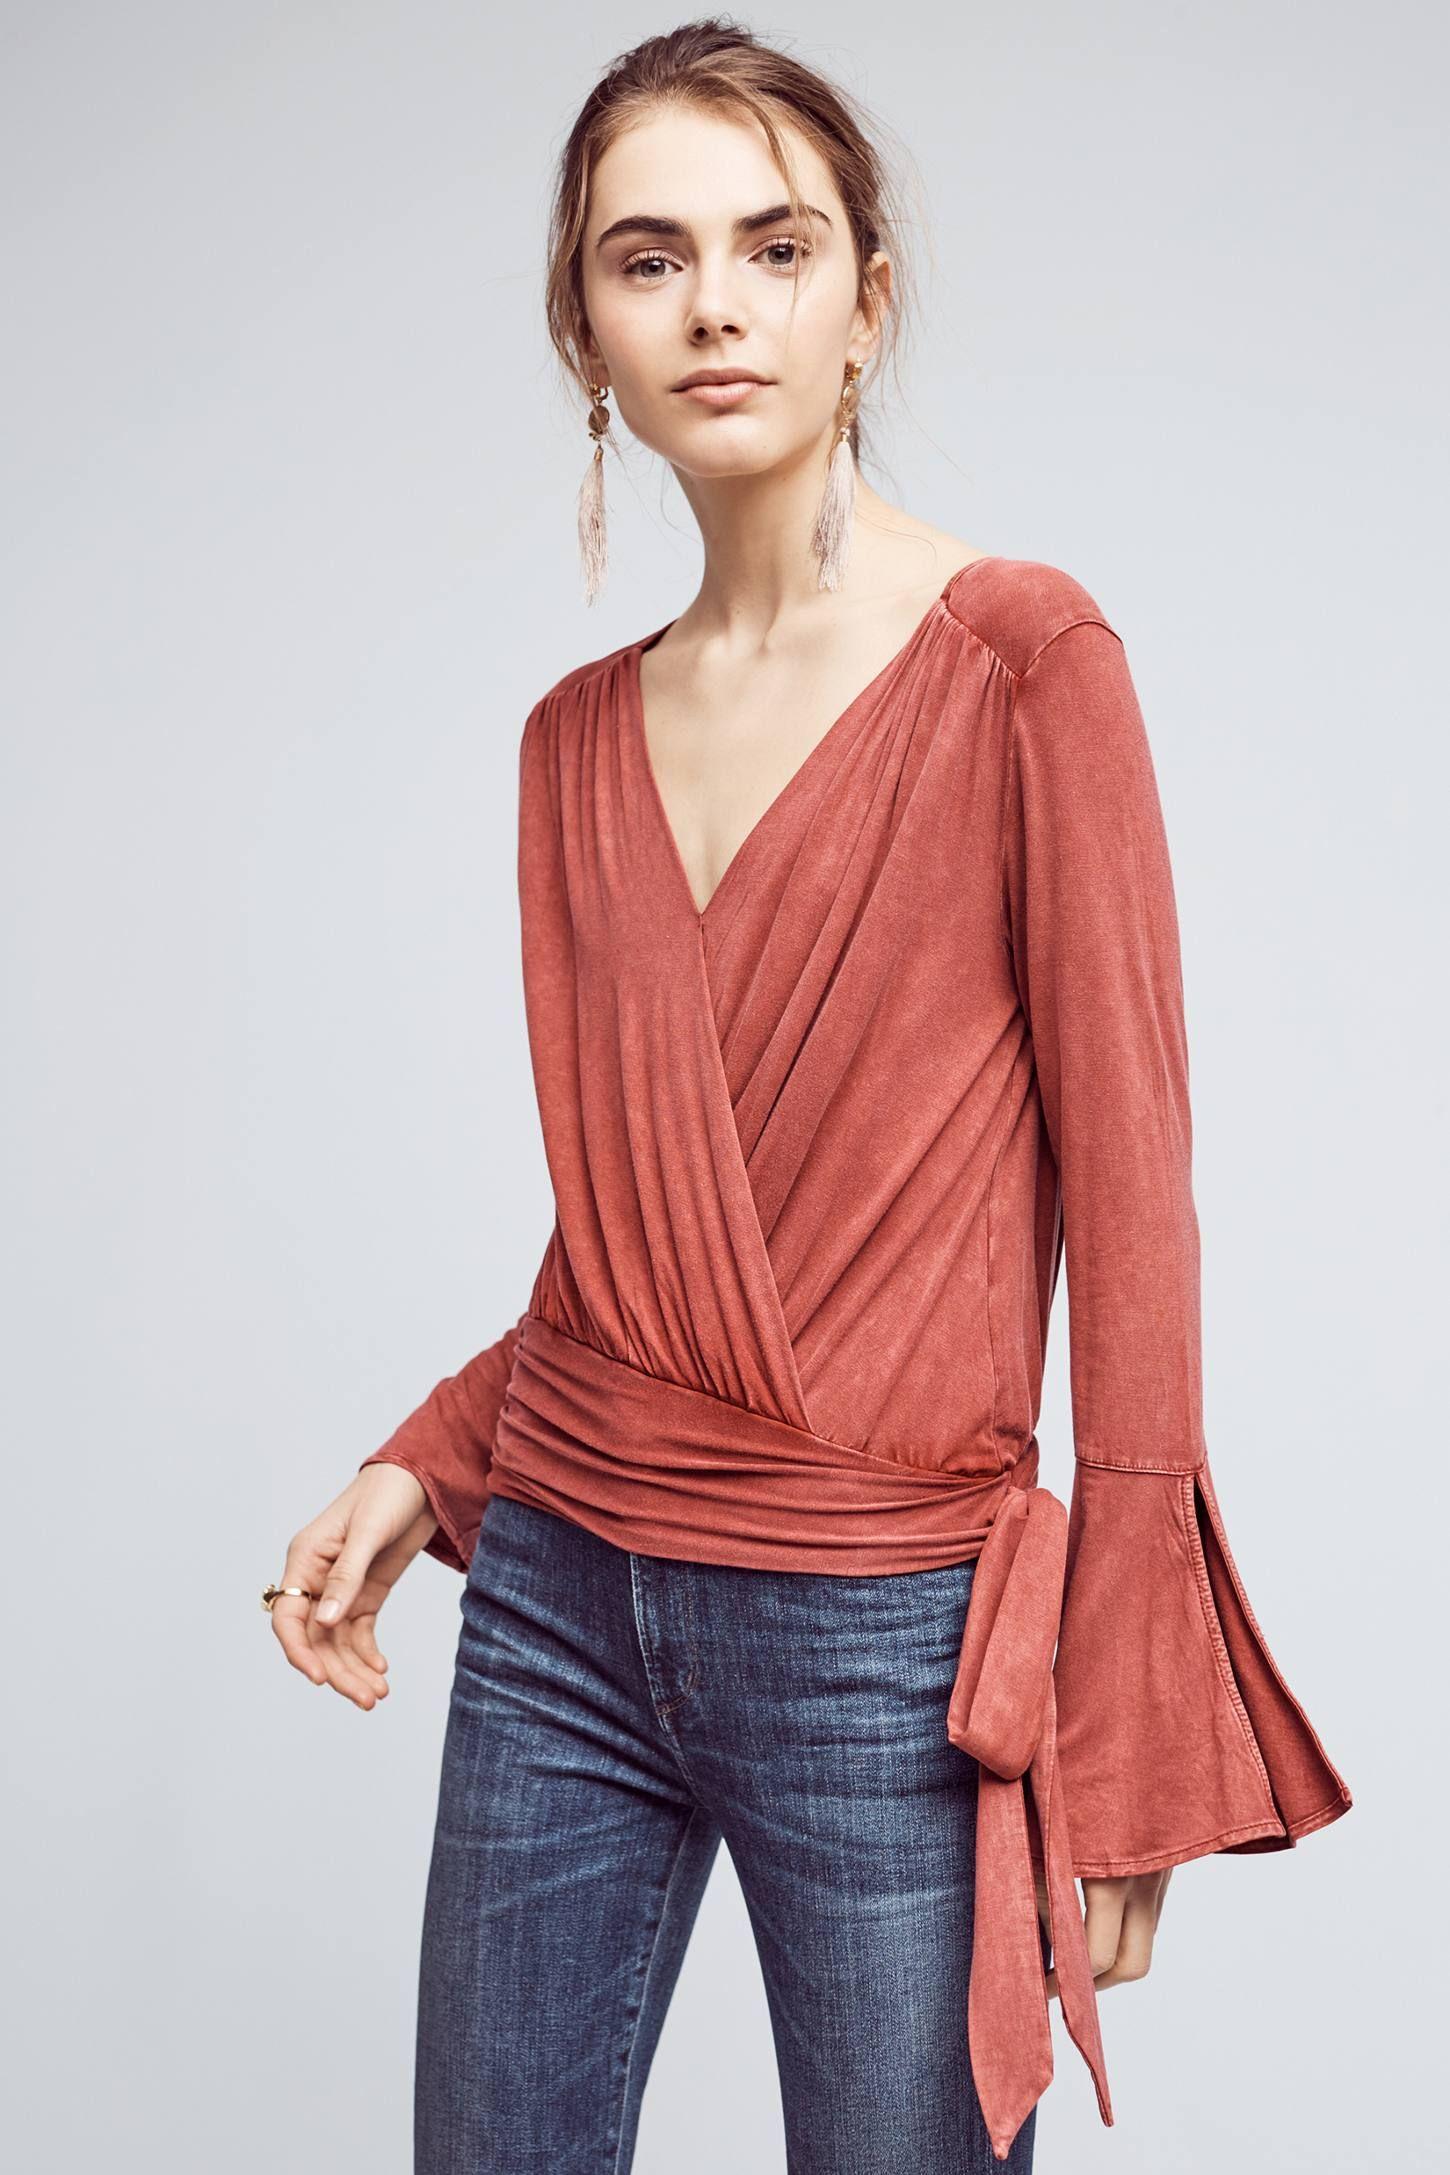 Sirpo Wrapped Pullover | Blusas, Blusas de manga larga y Blusas de manga